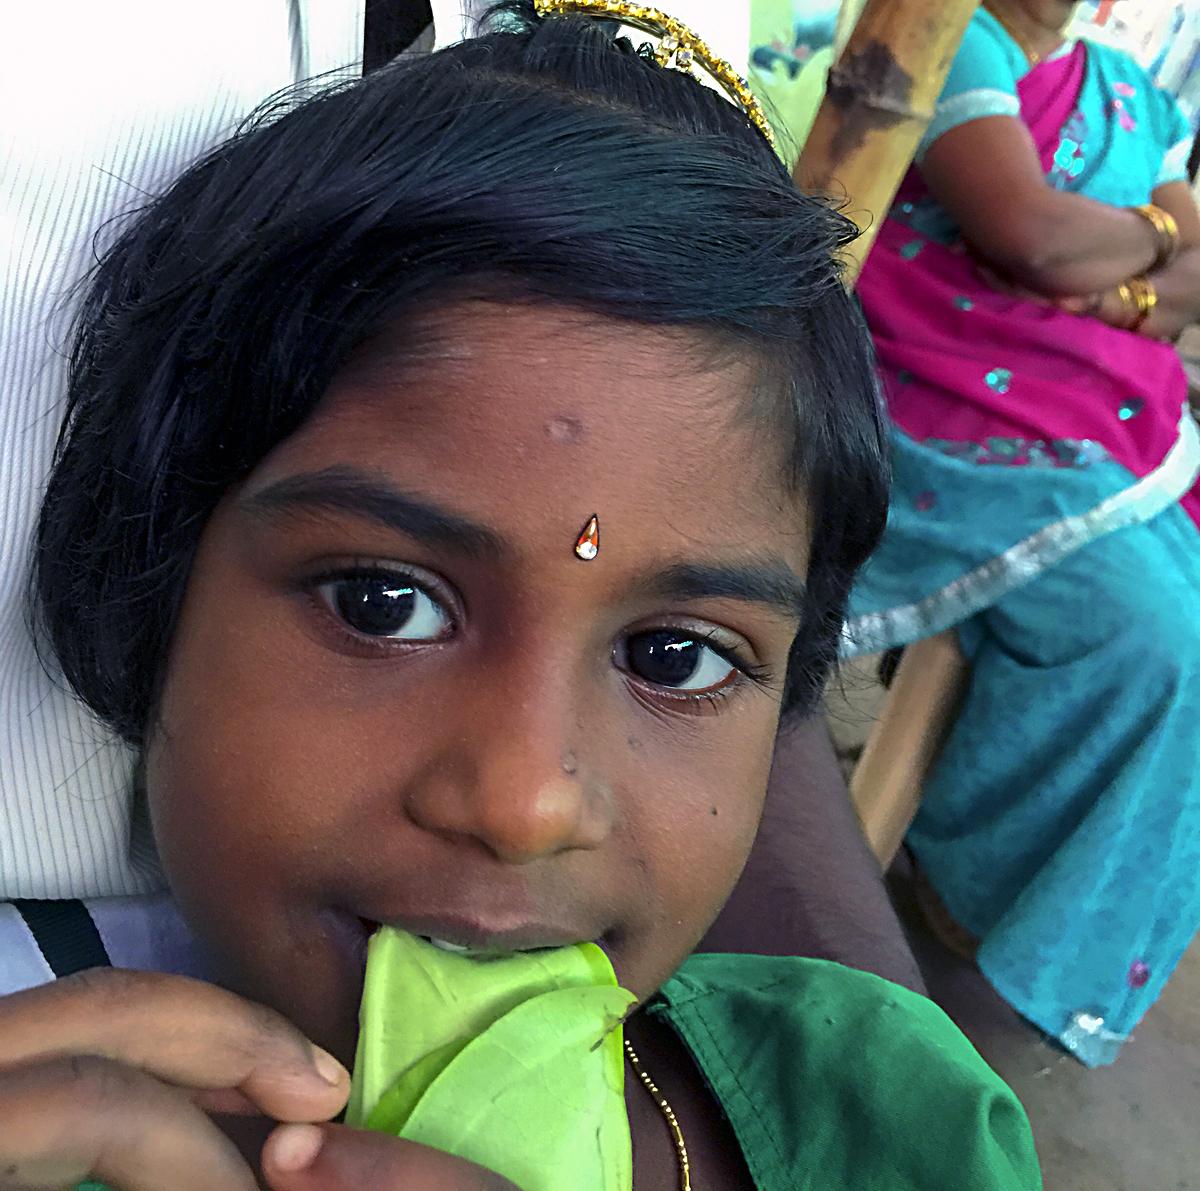 INDIEN Kumily Thekkady Kumarakom Kerala Menschen Tempel FINEST-onTour 2219.jpg